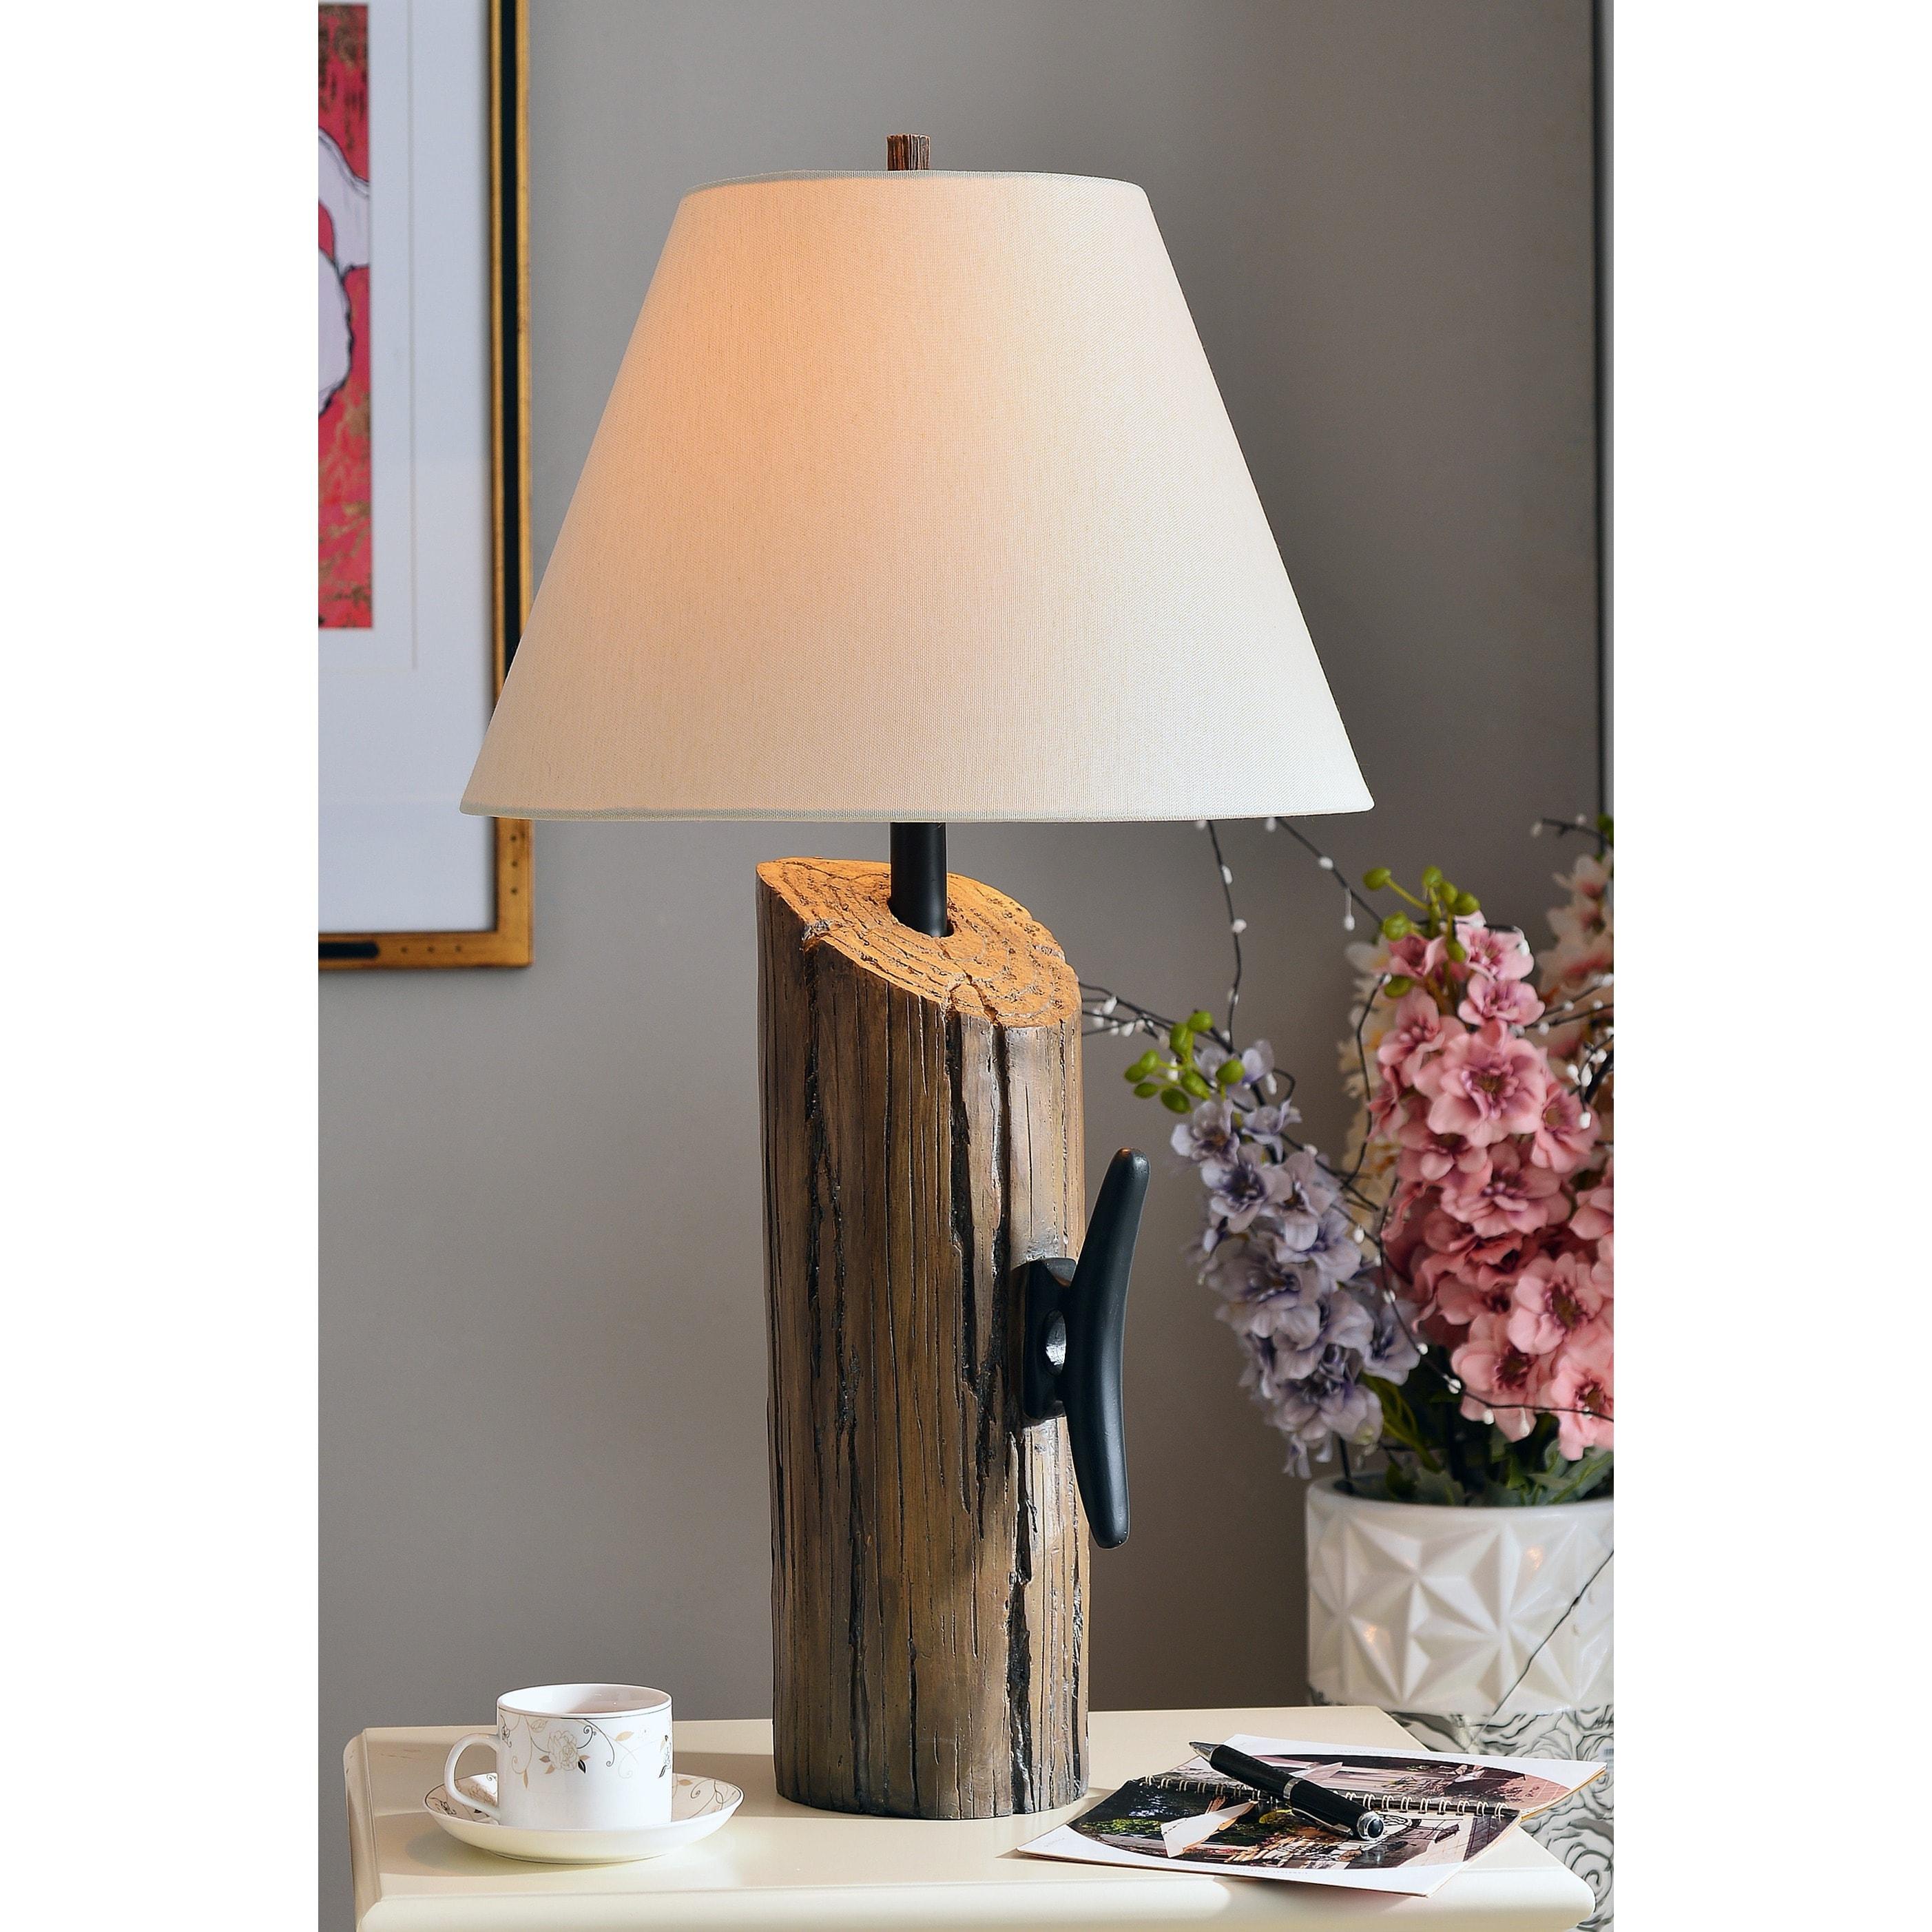 Design Craft Dockside Table Lamp, White (Wood)